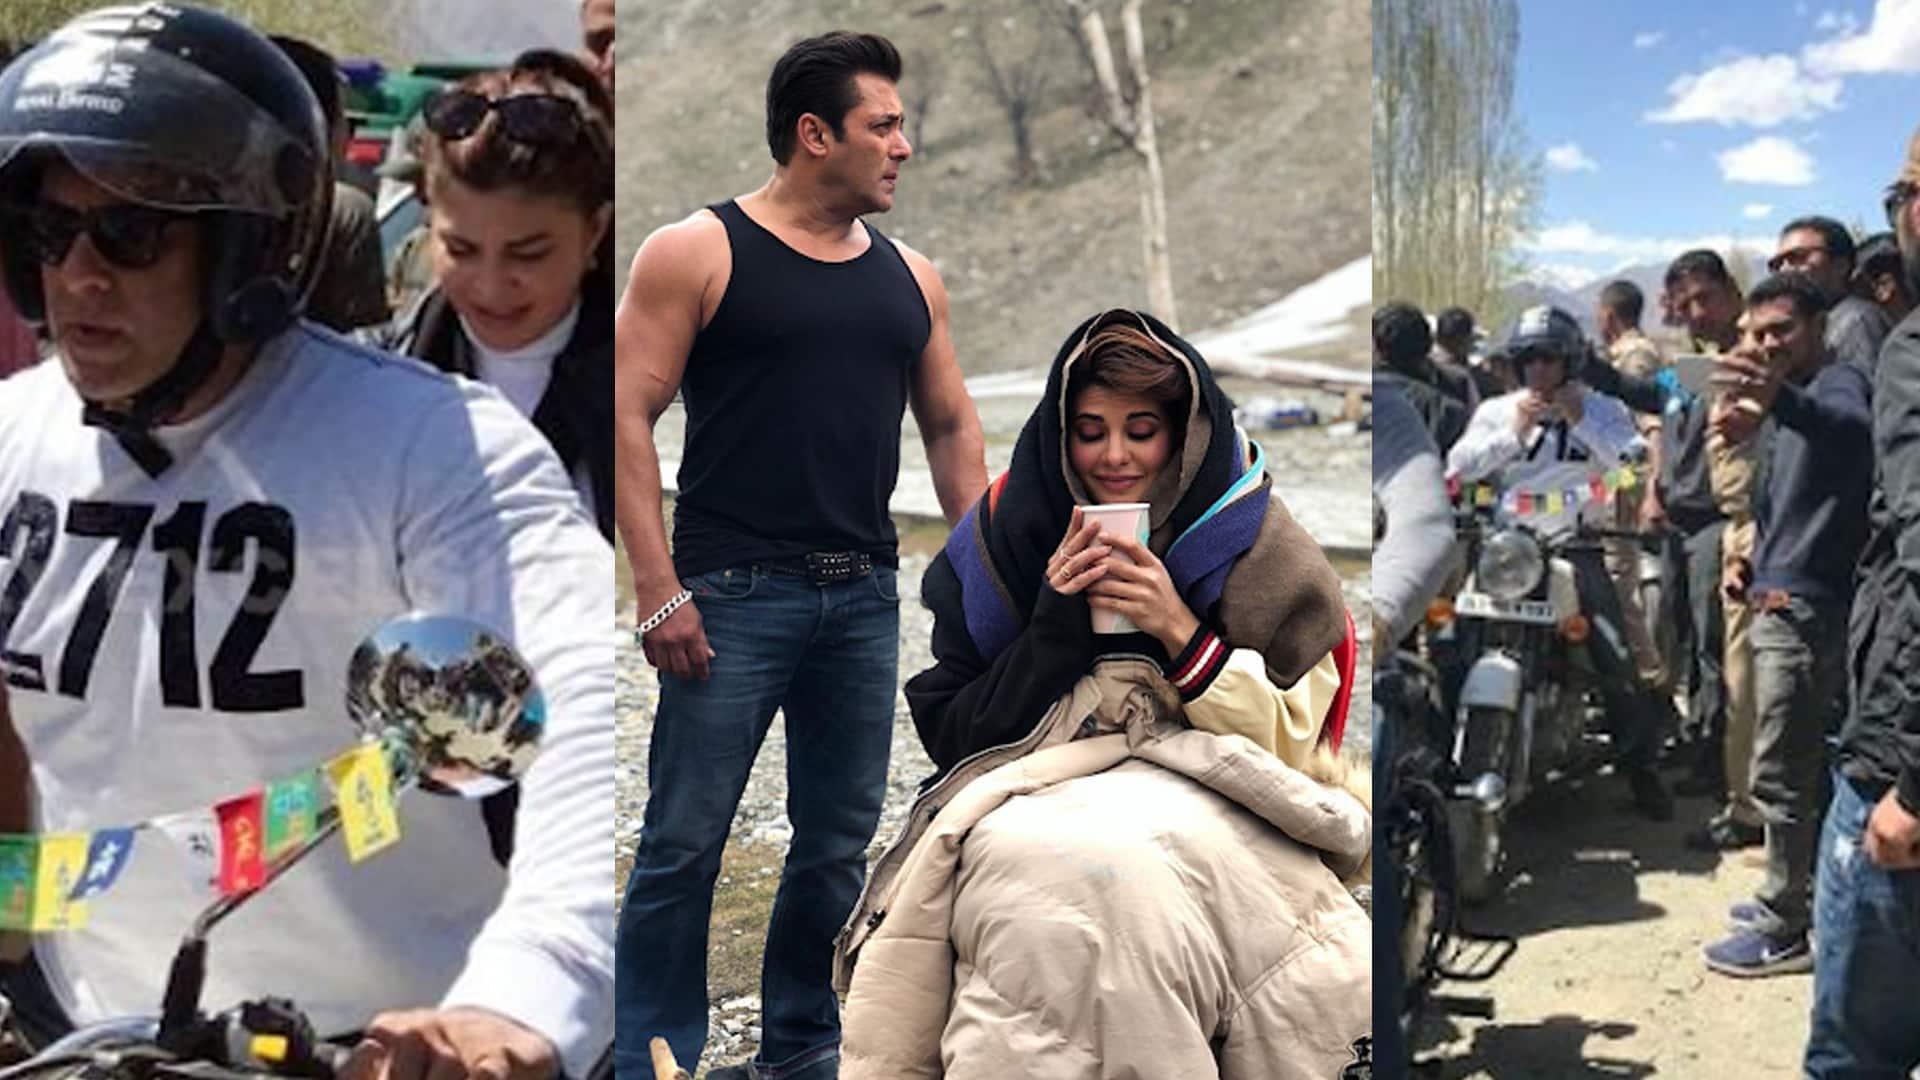 In Pics: Salman Khan takes Jacqueline Fernandez on a bike ride in Kargil